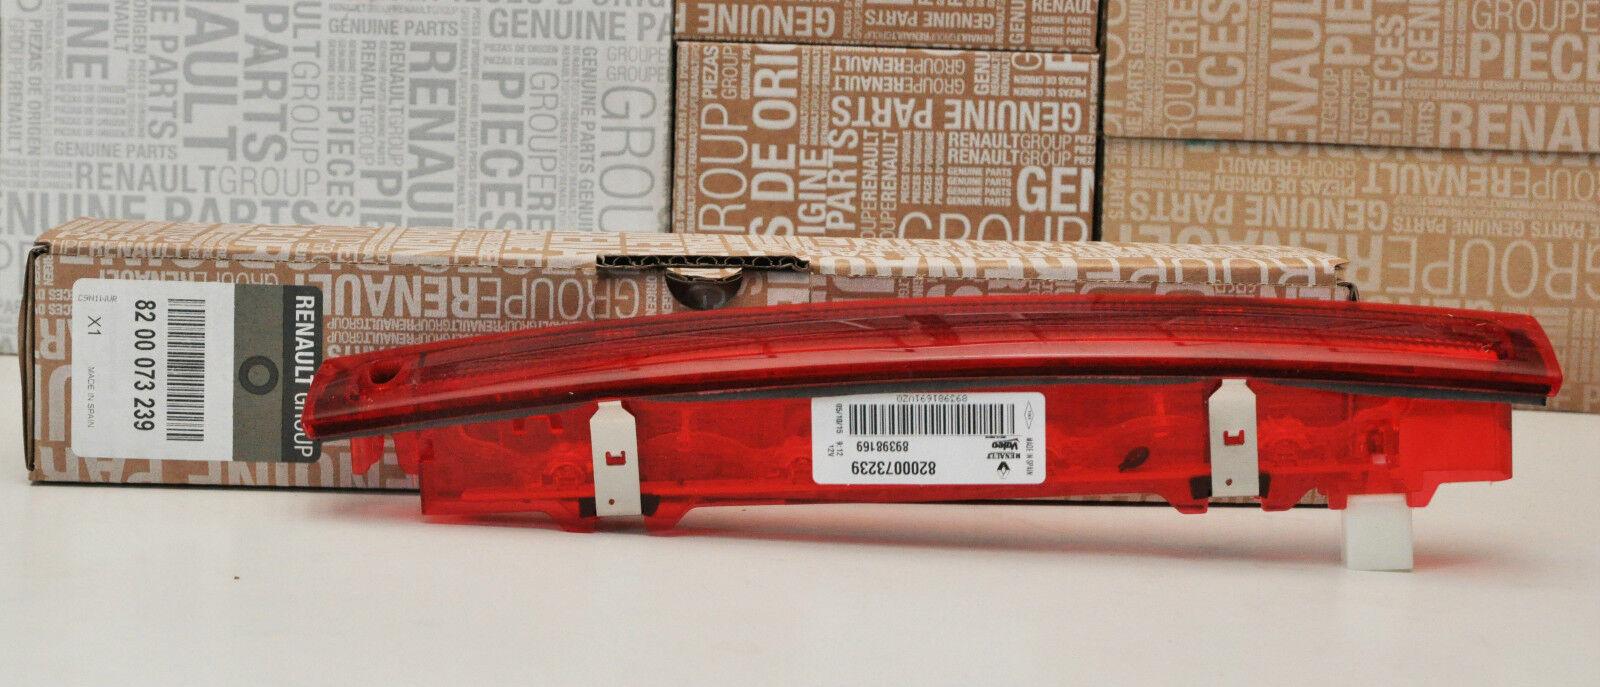 Renault Megane Mk2 High Level Brake Light 8200073239 Ebay Fuse Box Faults Norton Secured Powered By Verisign